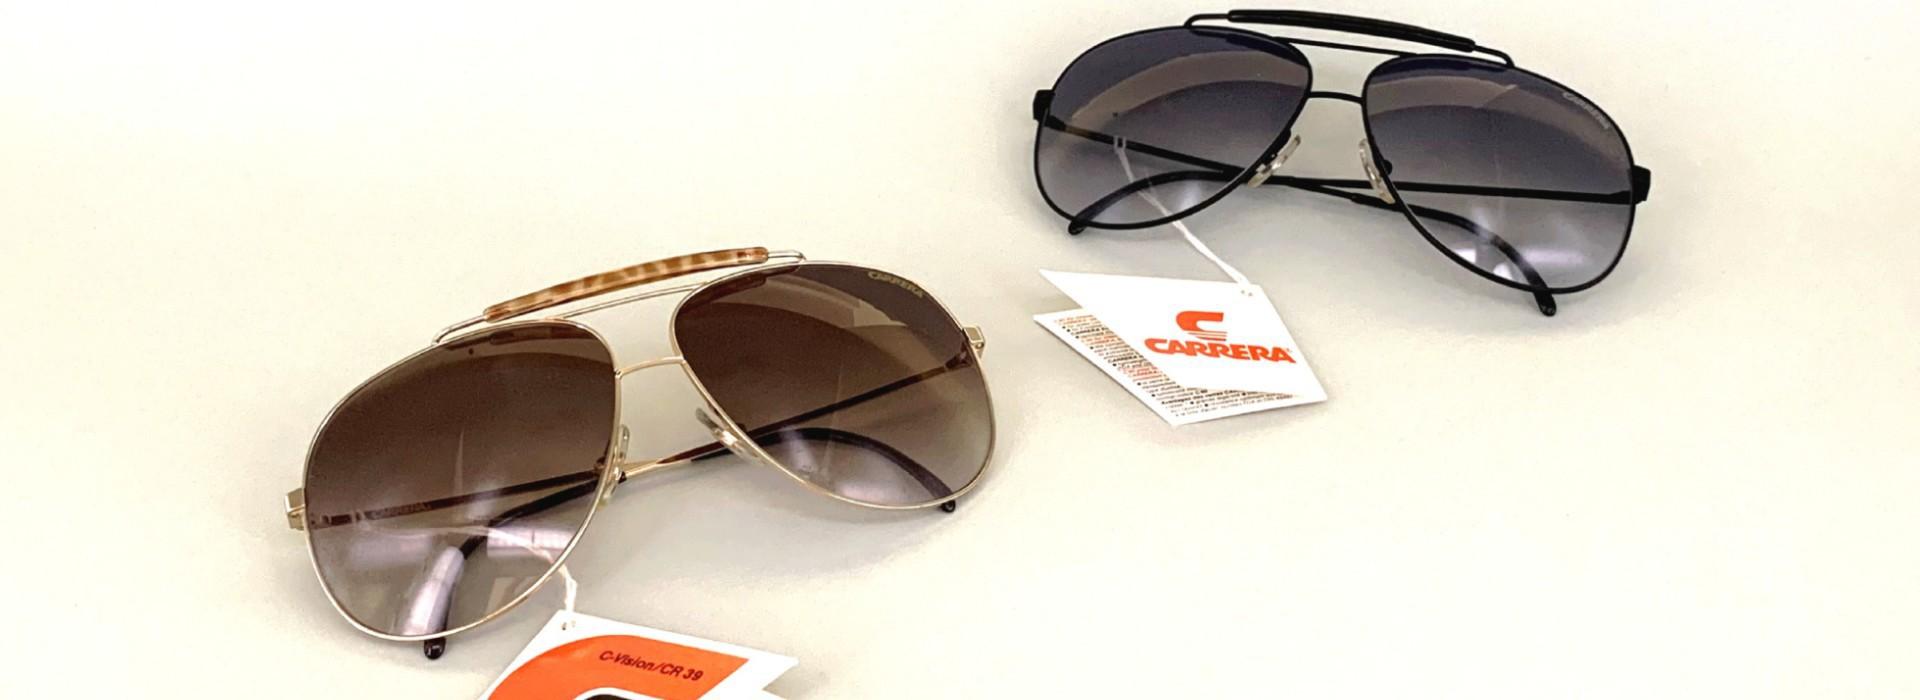 Carrera designer vintage sunglasses